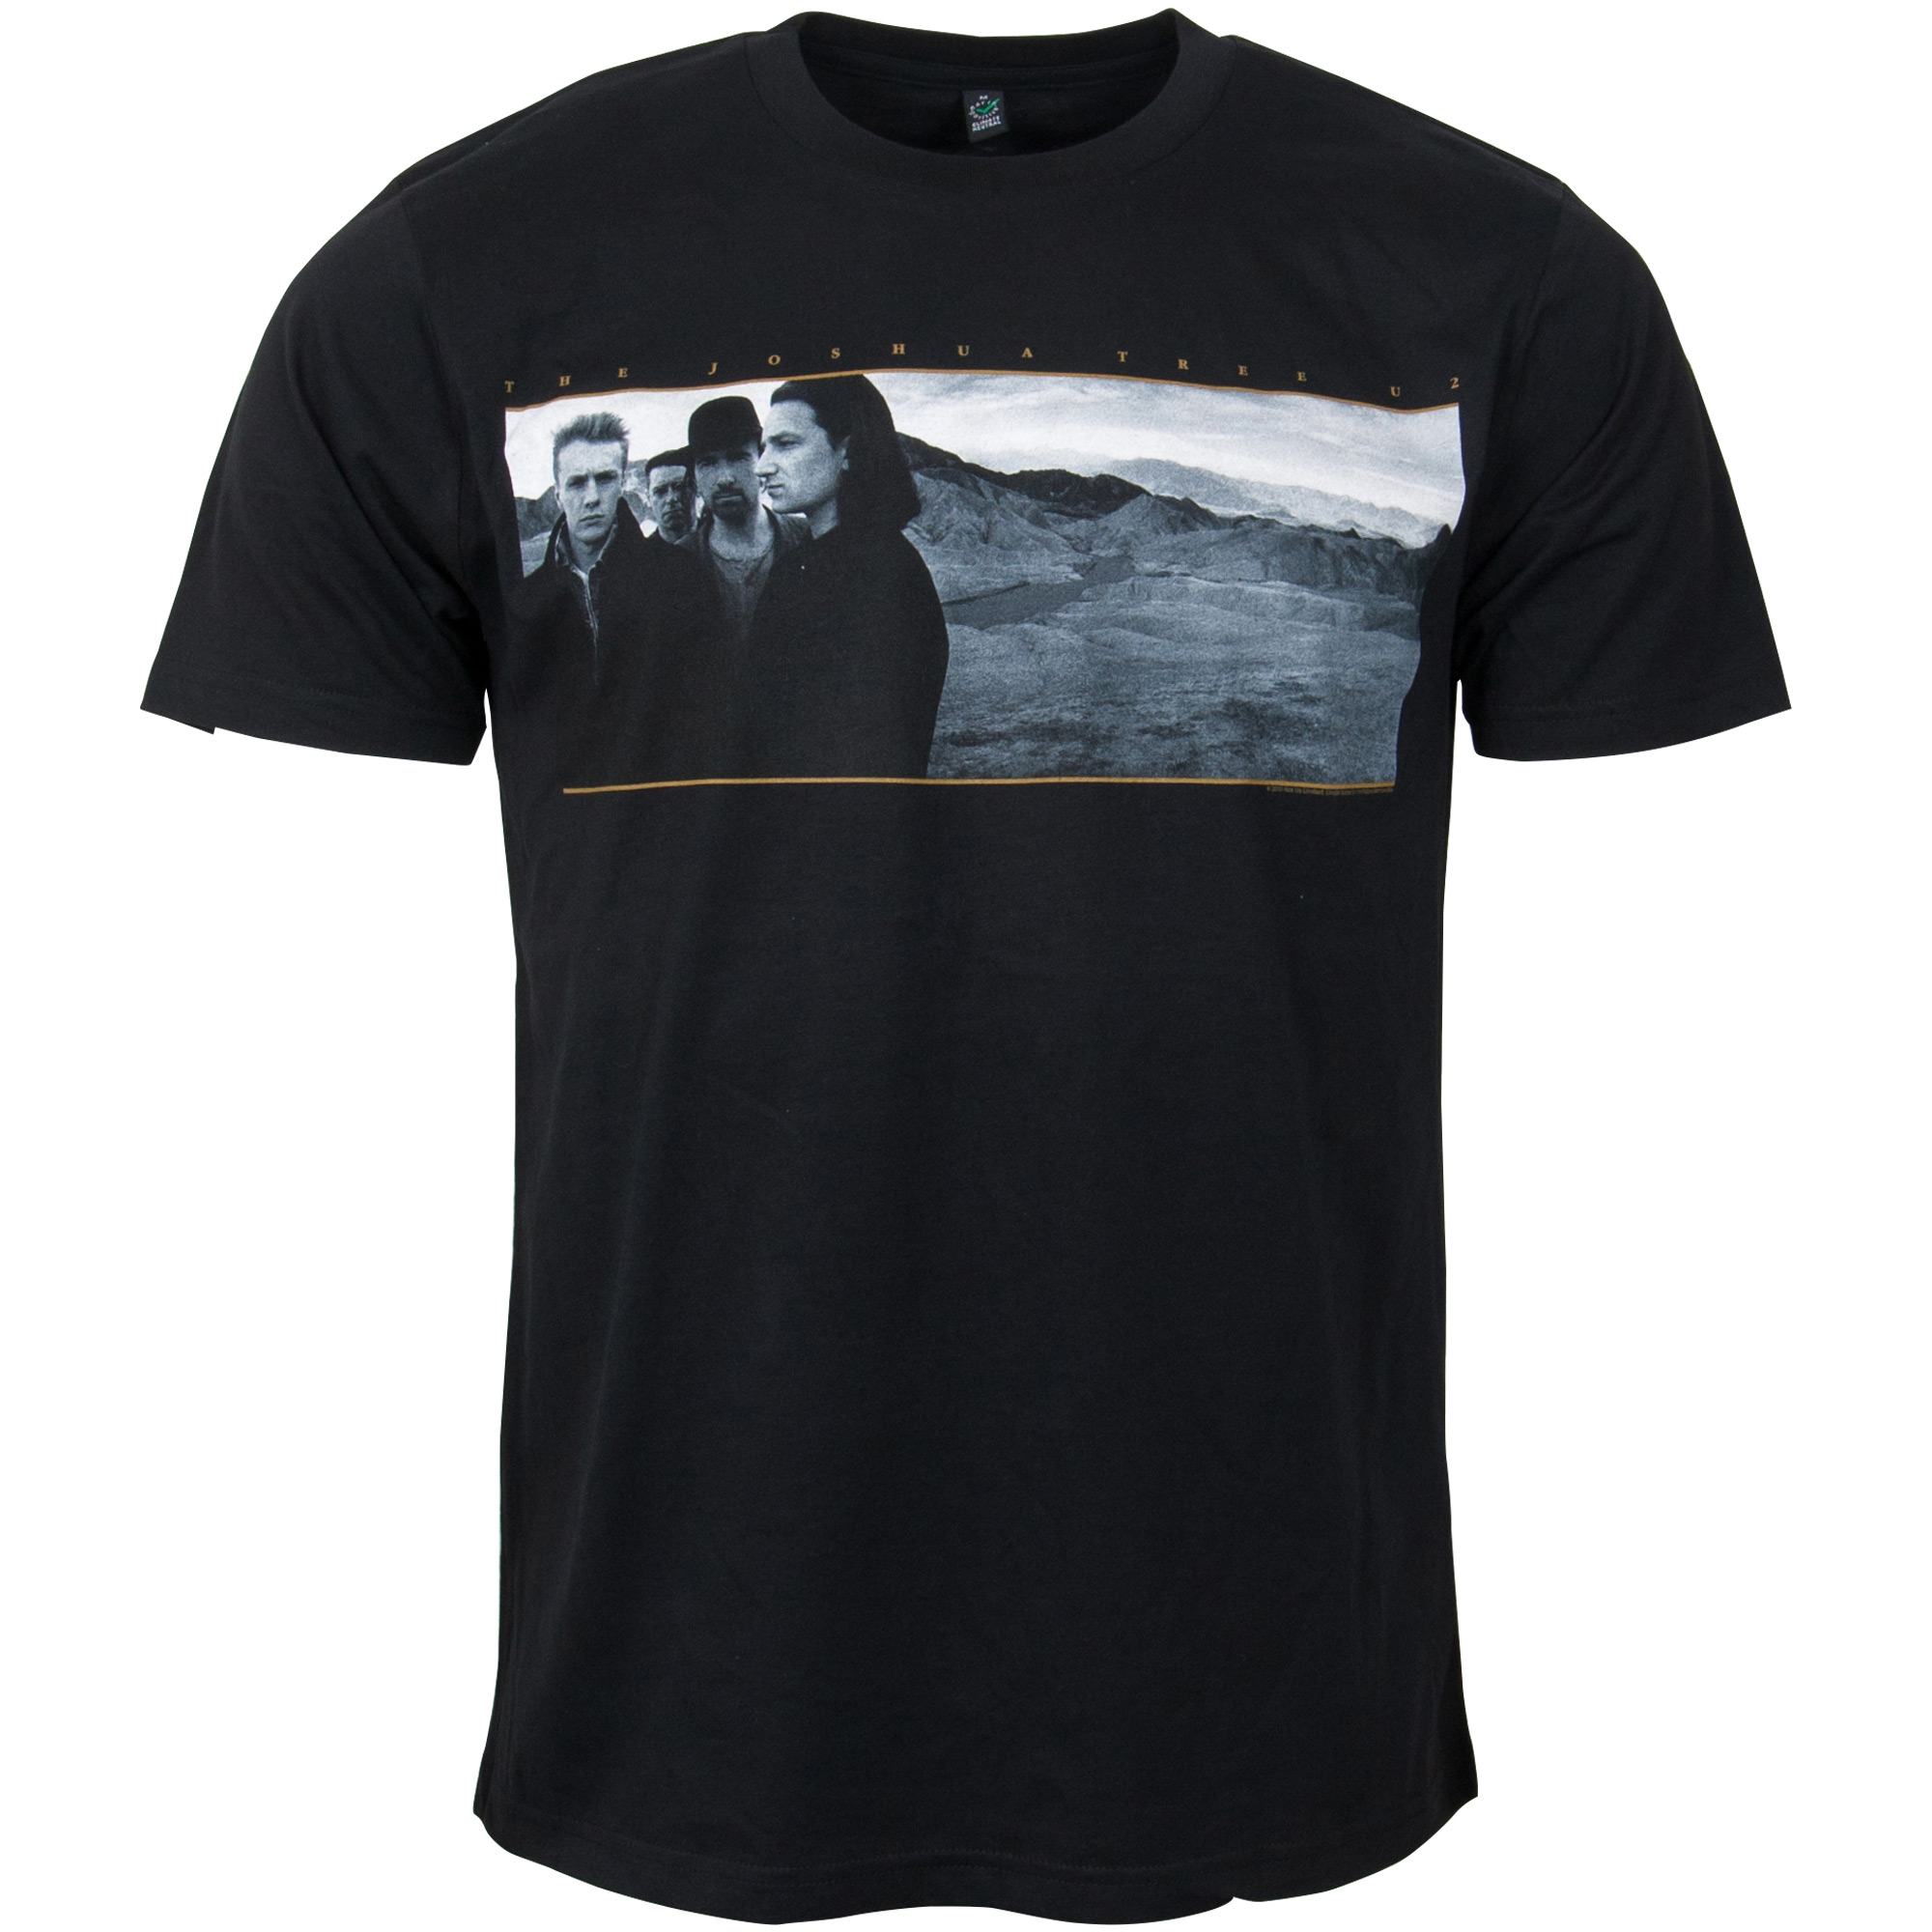 U2 - T-Shirt Joshua Tree - schwarz